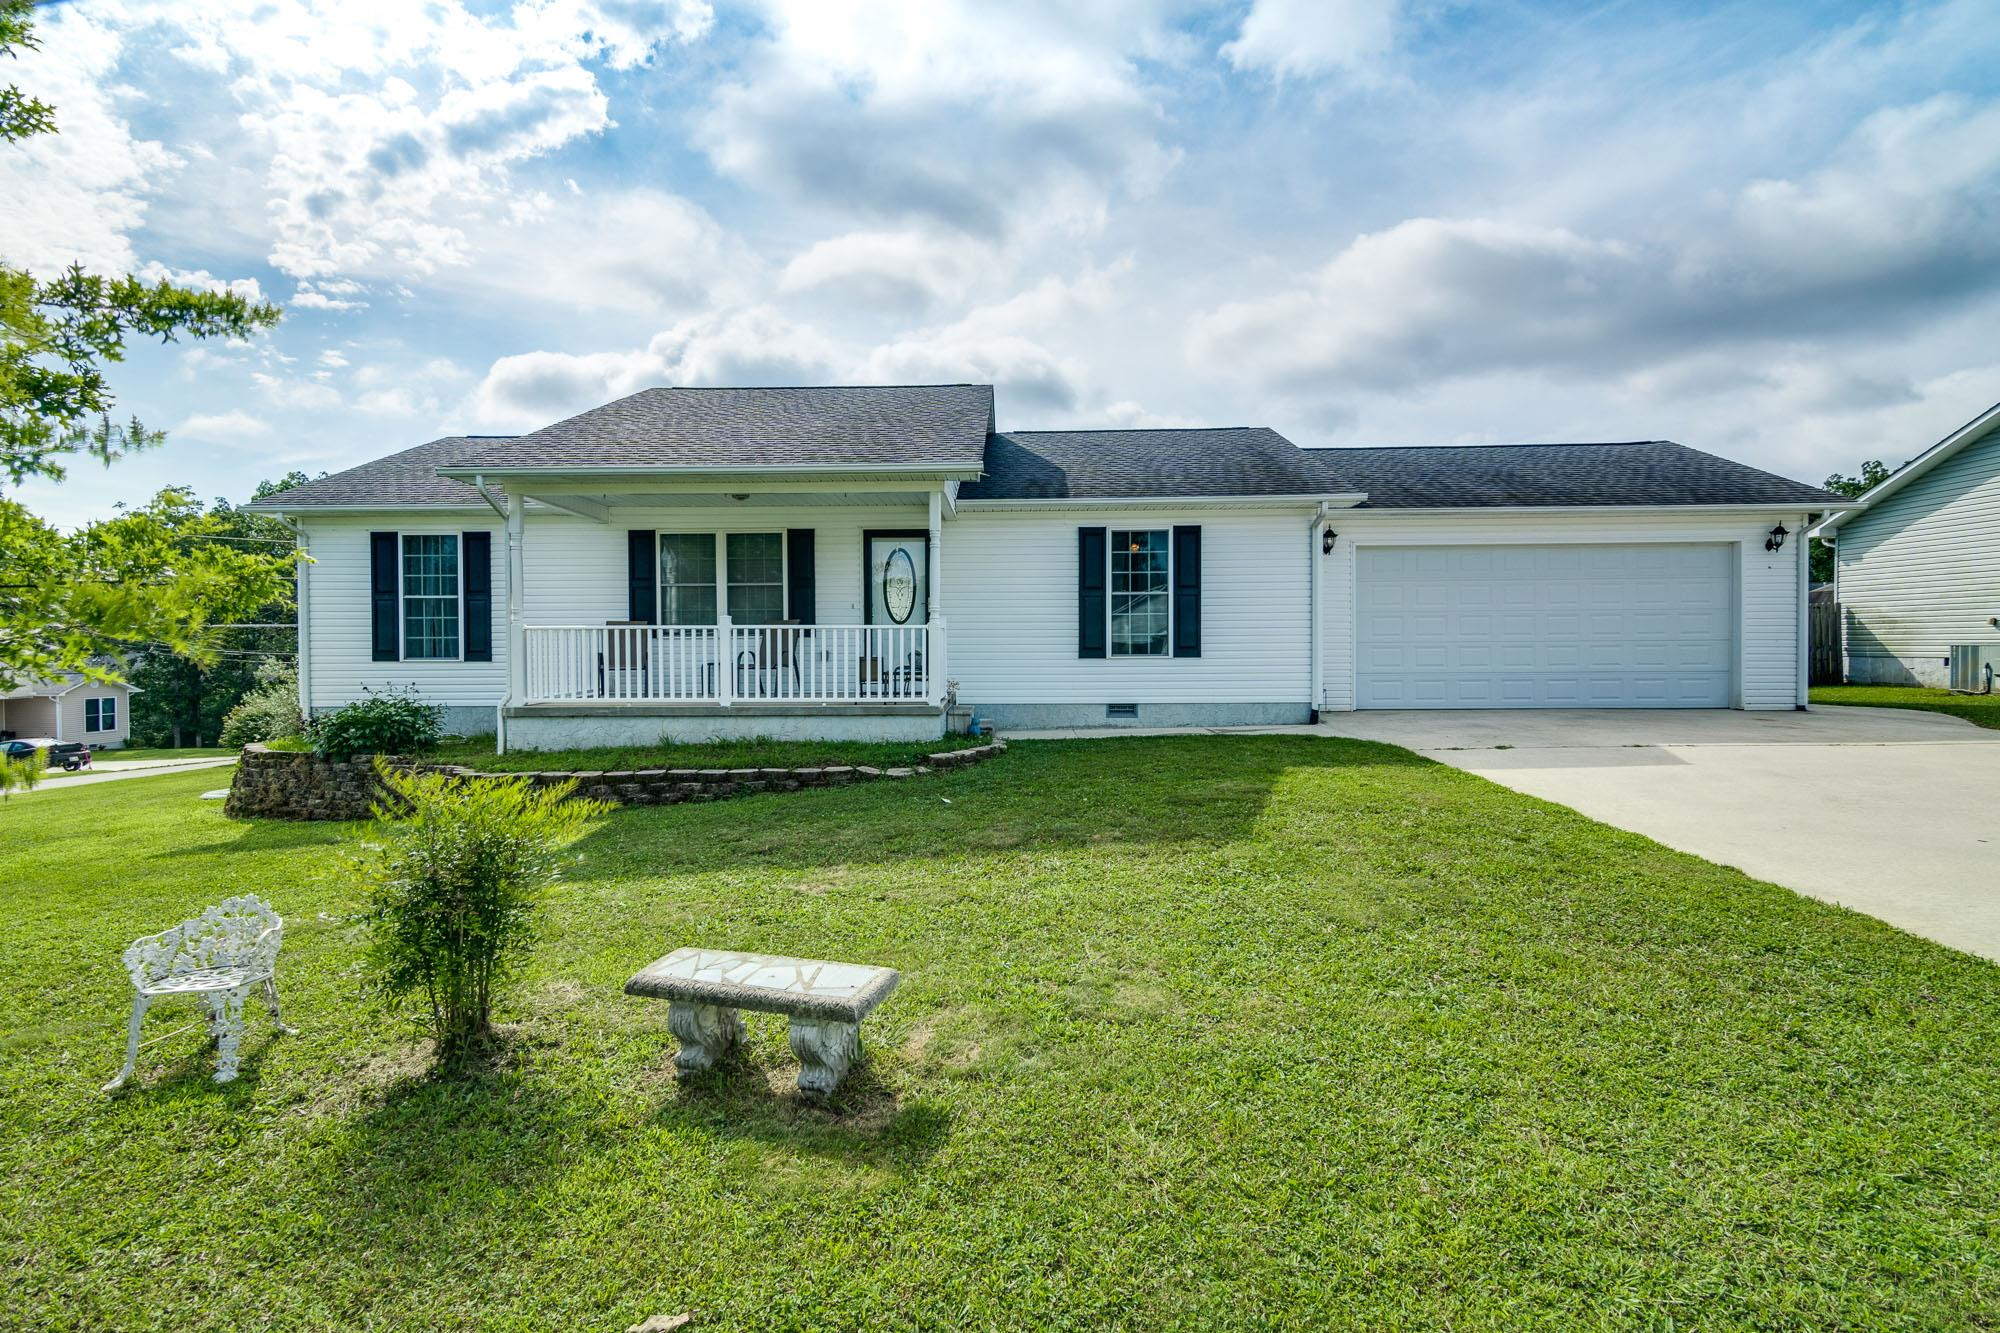 136 Hunter Dr, Crossville, TN 38555 - Crossville, TN real estate listing